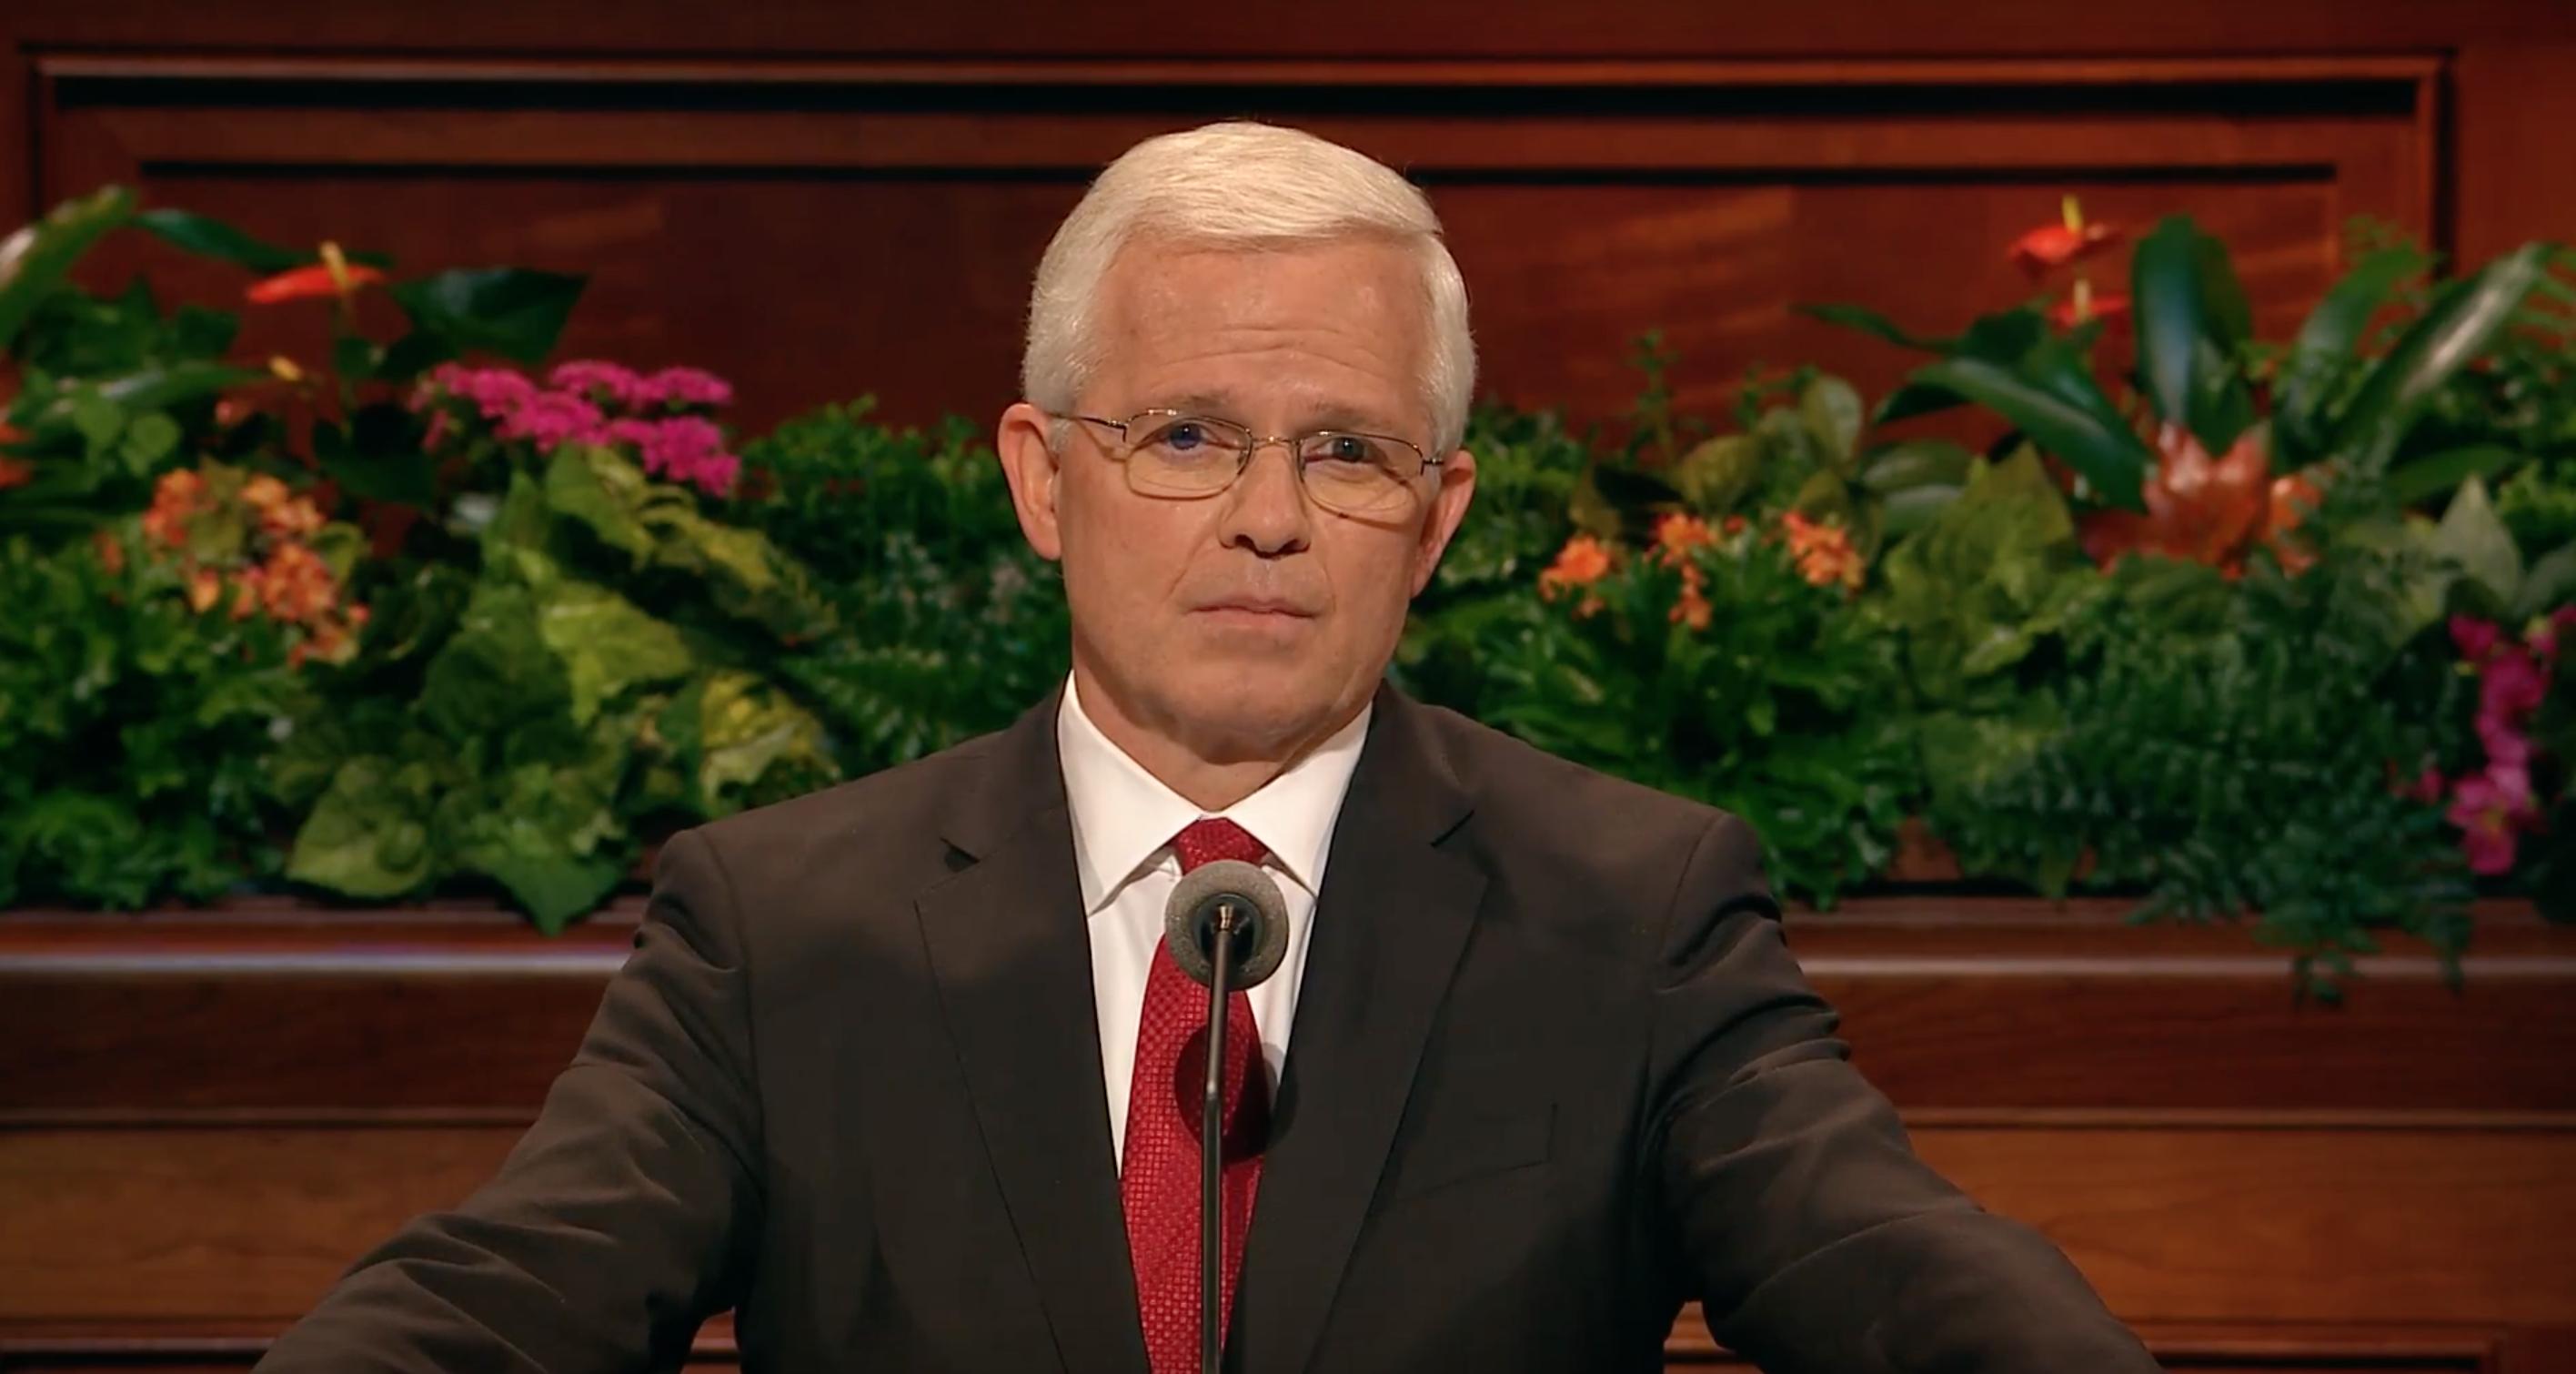 Elder Matthew L. Carpenter speaks during the Sunday afternoon session of October 2018 general conference.